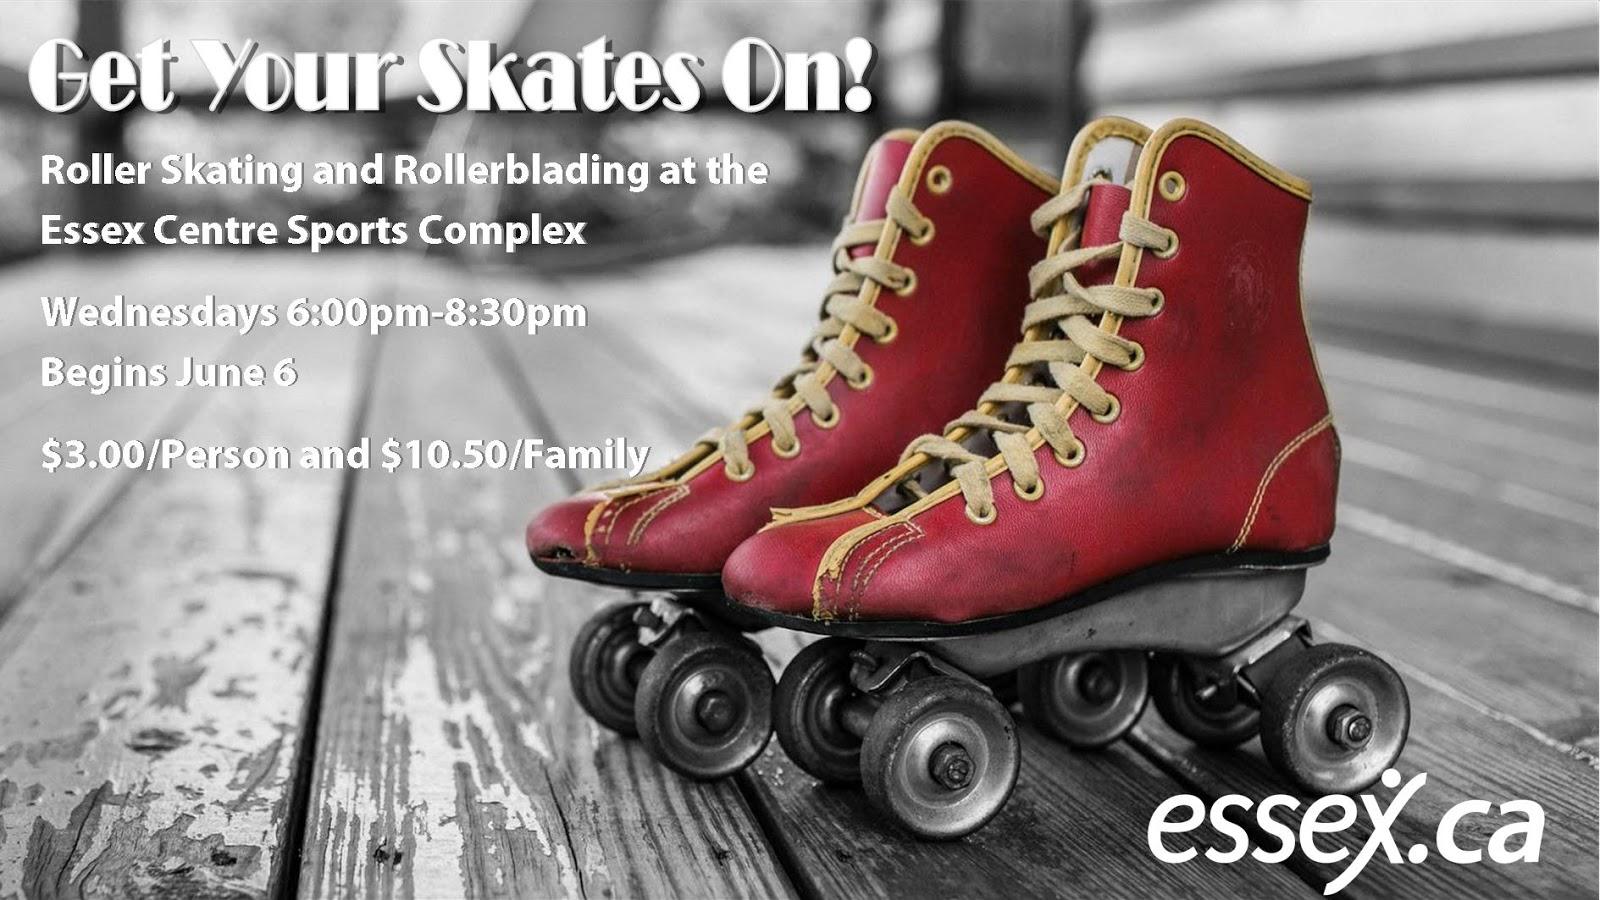 Roller skating in essex